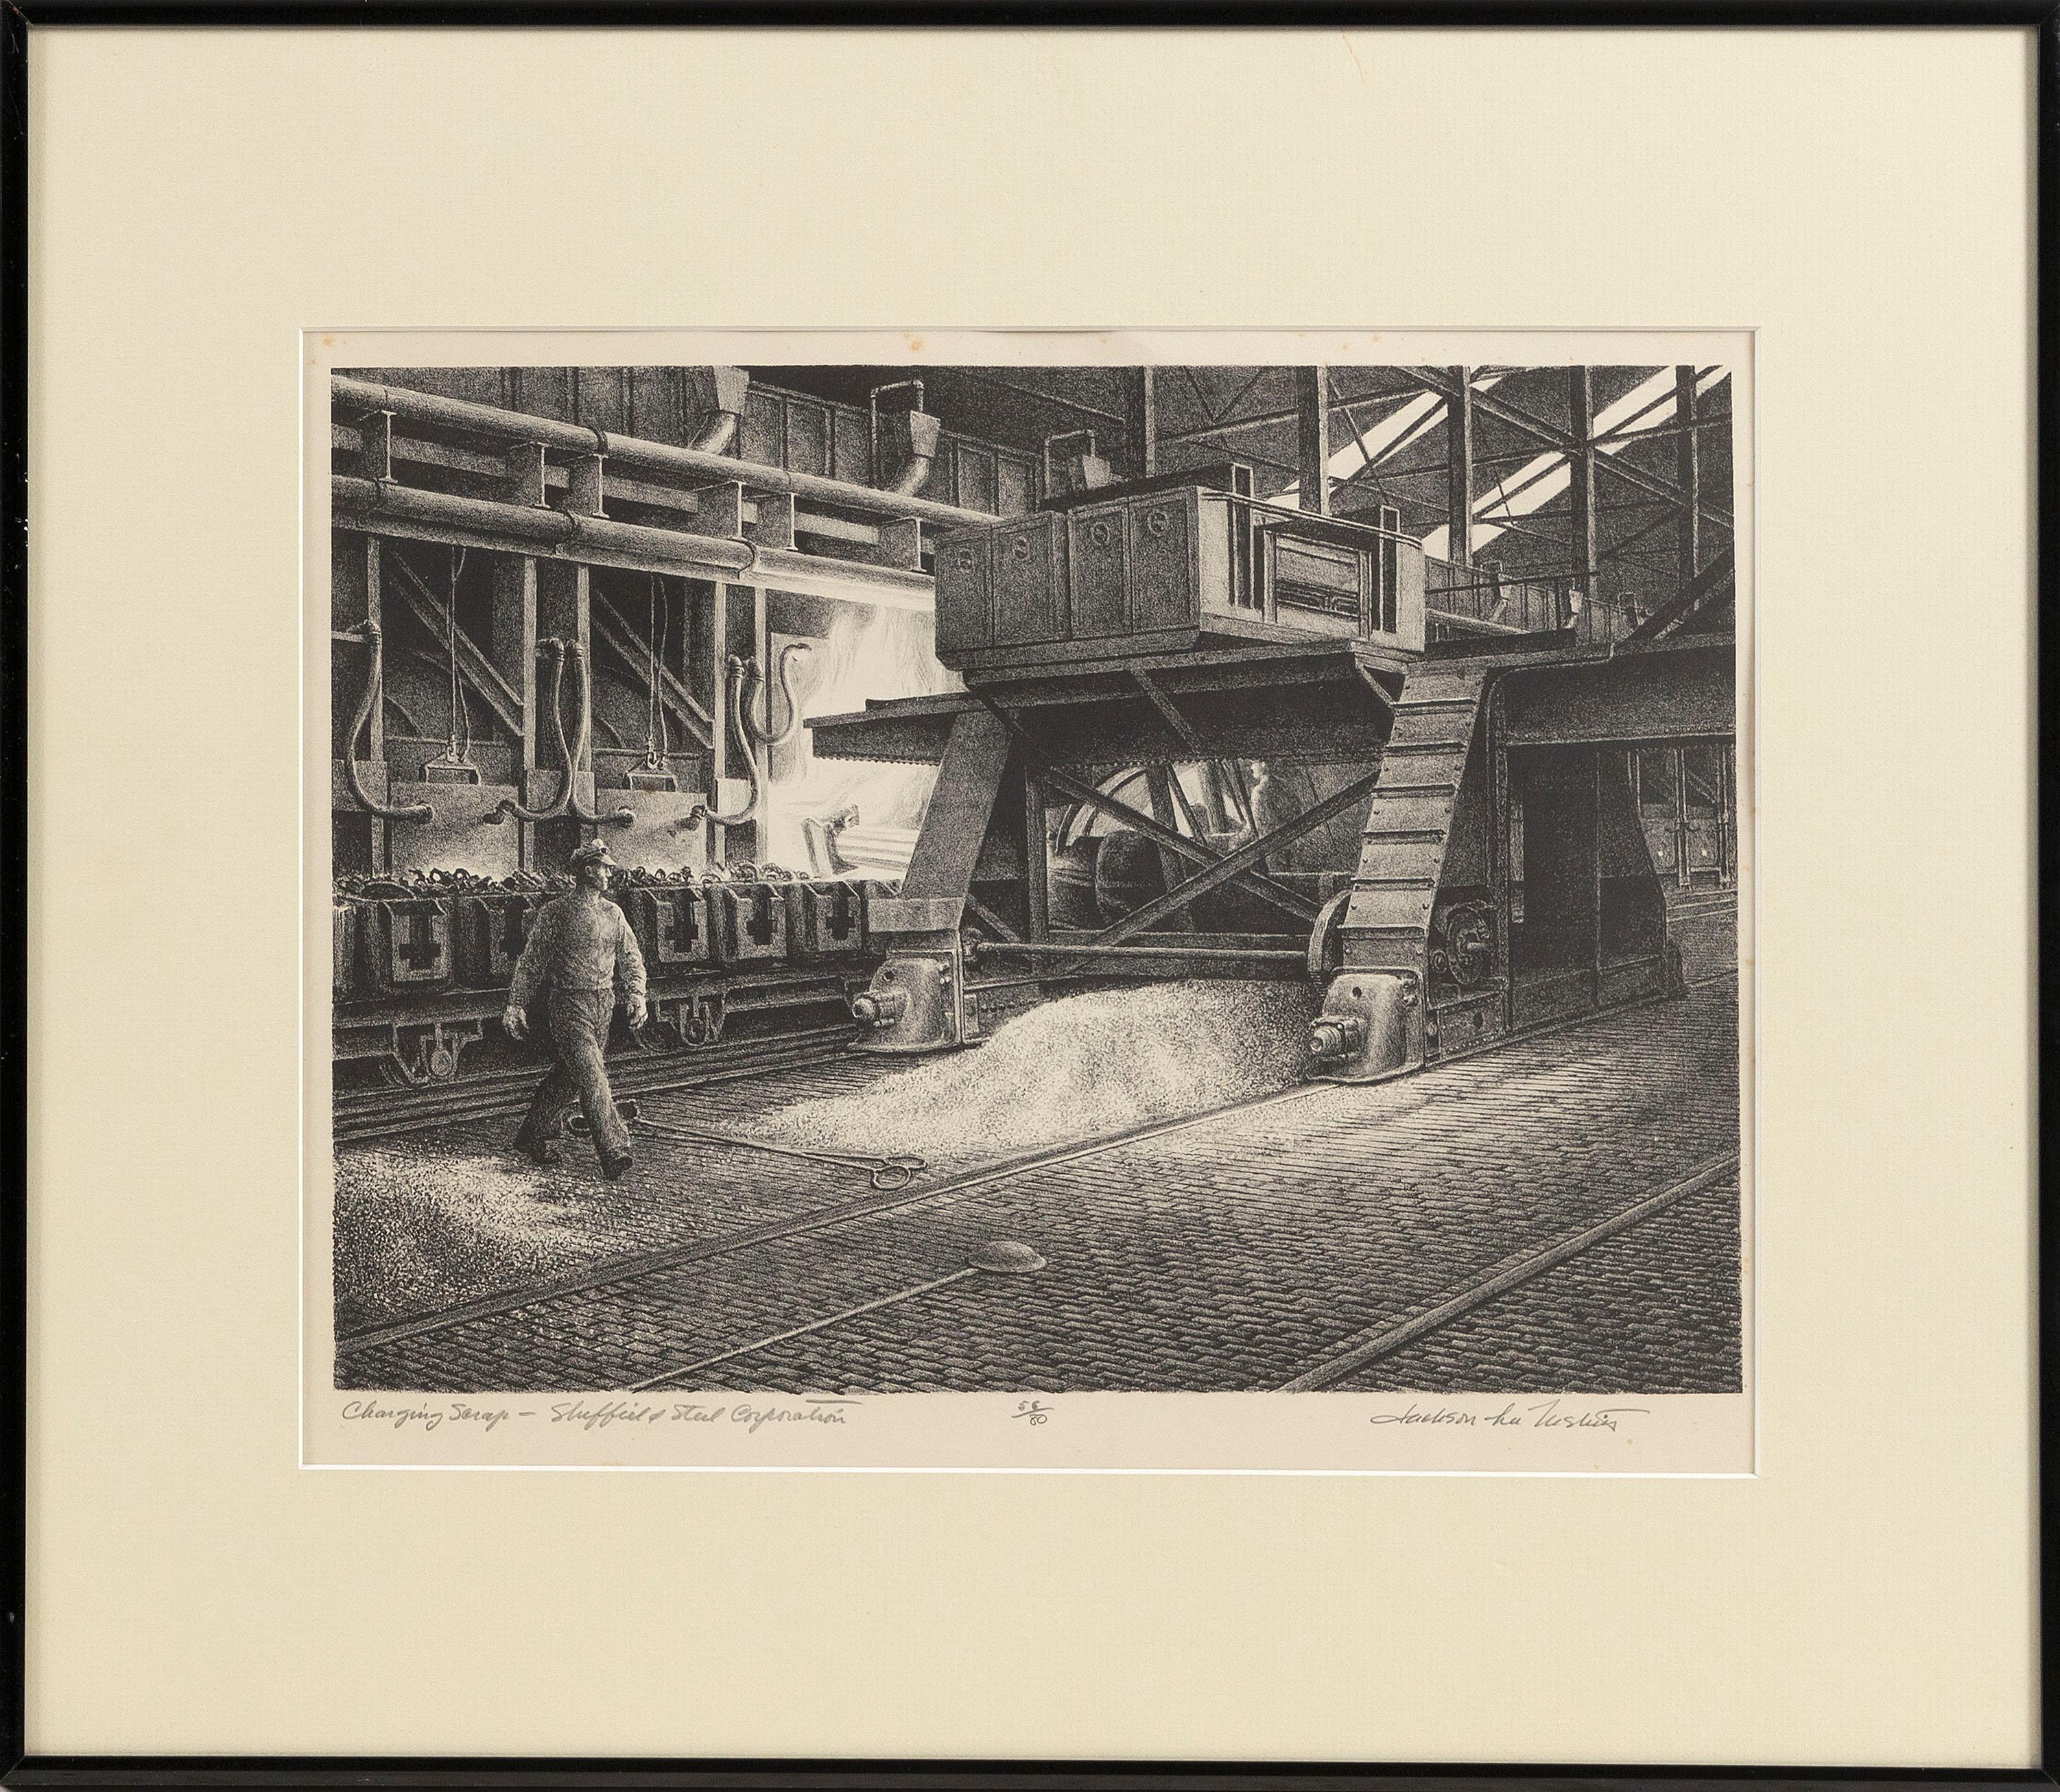 "JACKSON LEE NESBITT (Missouri/Oklahoma, 1913-2008), ""Charging Scrap - Sheffield Steel Corporation""., Lithograph, 9.75"" x 13.75"" to the plate line. Framed 17"" x 20"". Paper size 14.5"" x 19.5""."